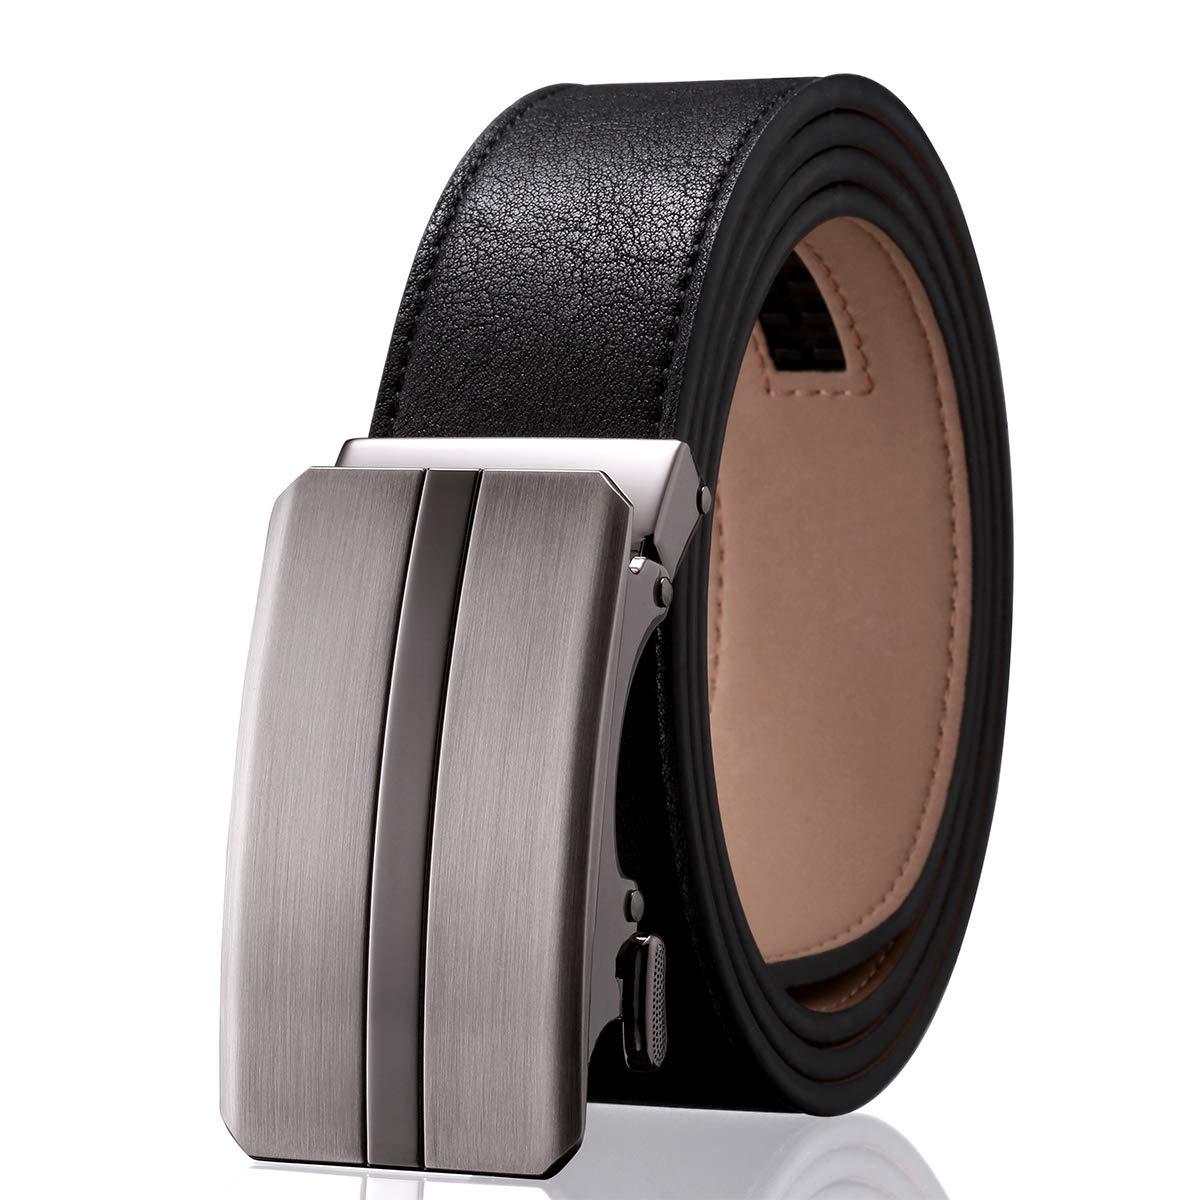 Men' s Dress Adjustable Ratchet Belt - Black Leather Belts Automatic Buckle Solid Zine-Alloy Flytop